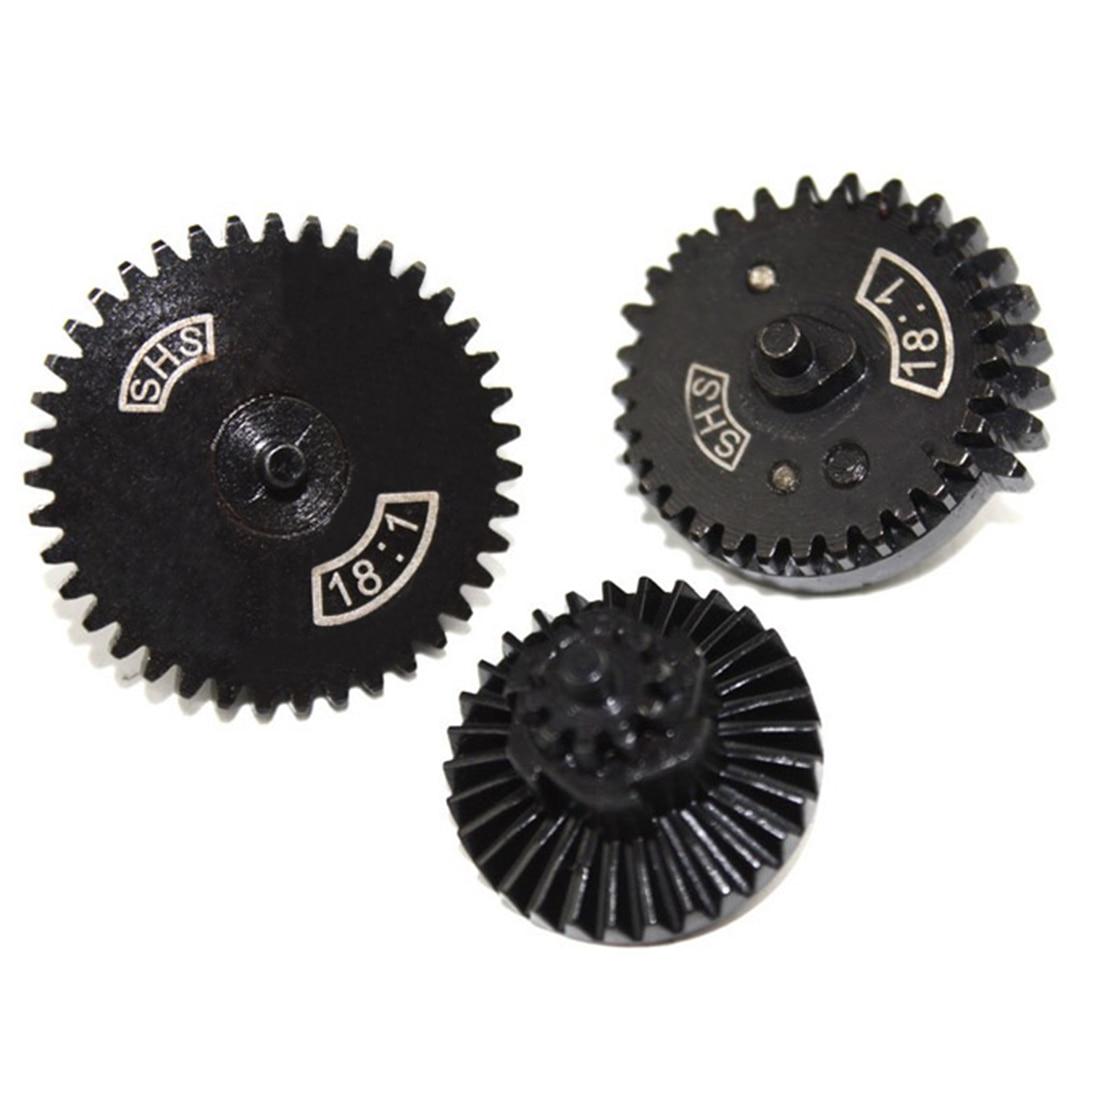 SHS 18/1 Straight Tooth Steel Gear Set for JM Gen.8/for JM Gen.9 Water Gel Beads Blaster Modificaton and Upgrade Black